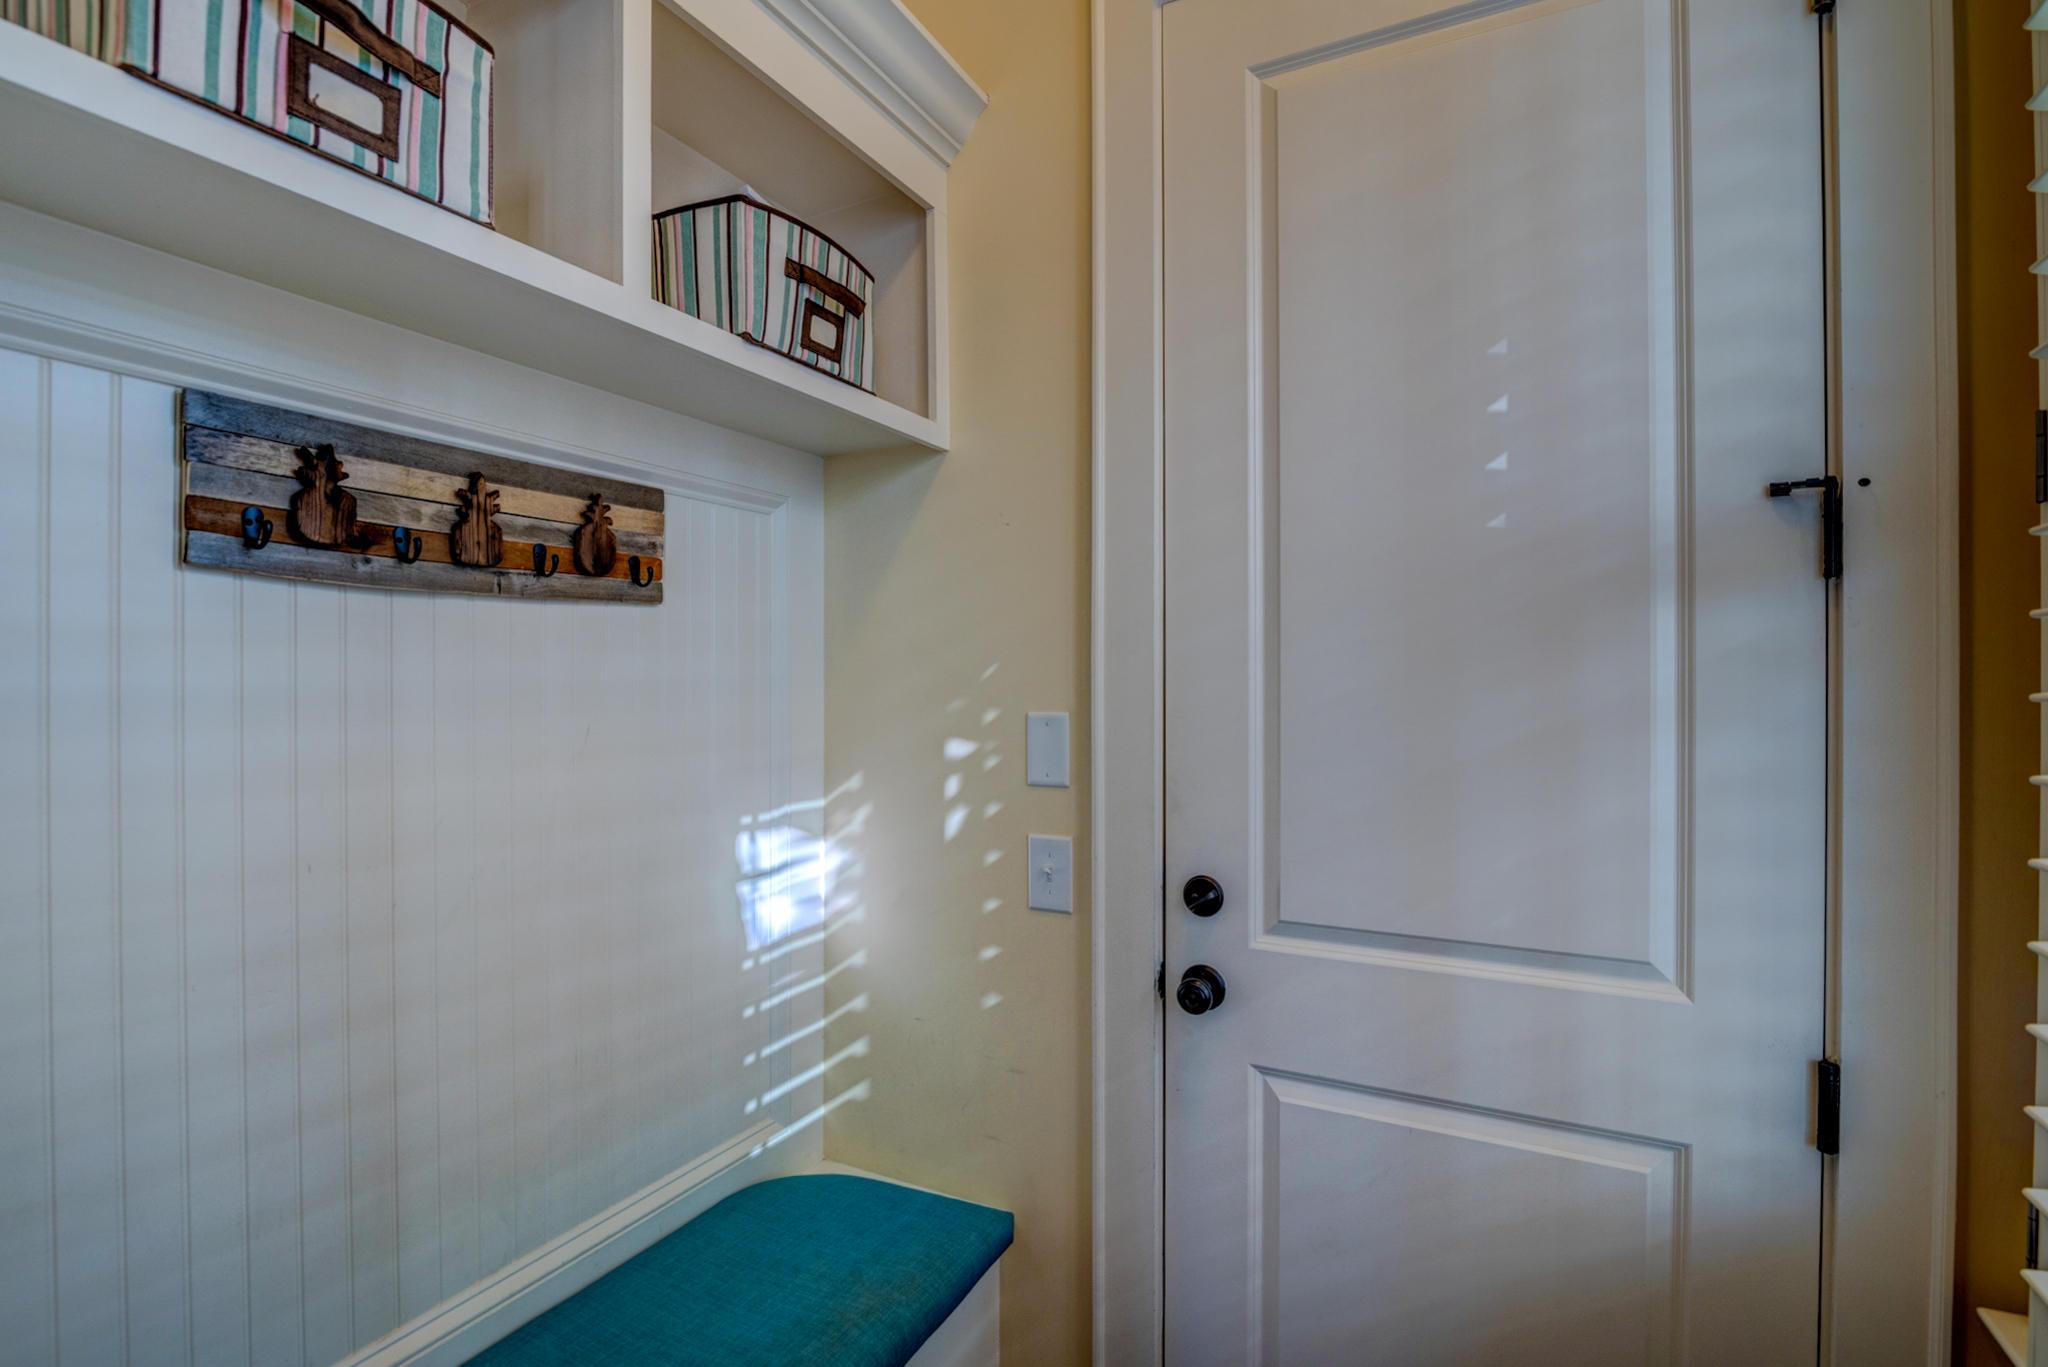 Daniel Island Smythe Park Homes For Sale - 1662 Pierce, Charleston, SC - 37